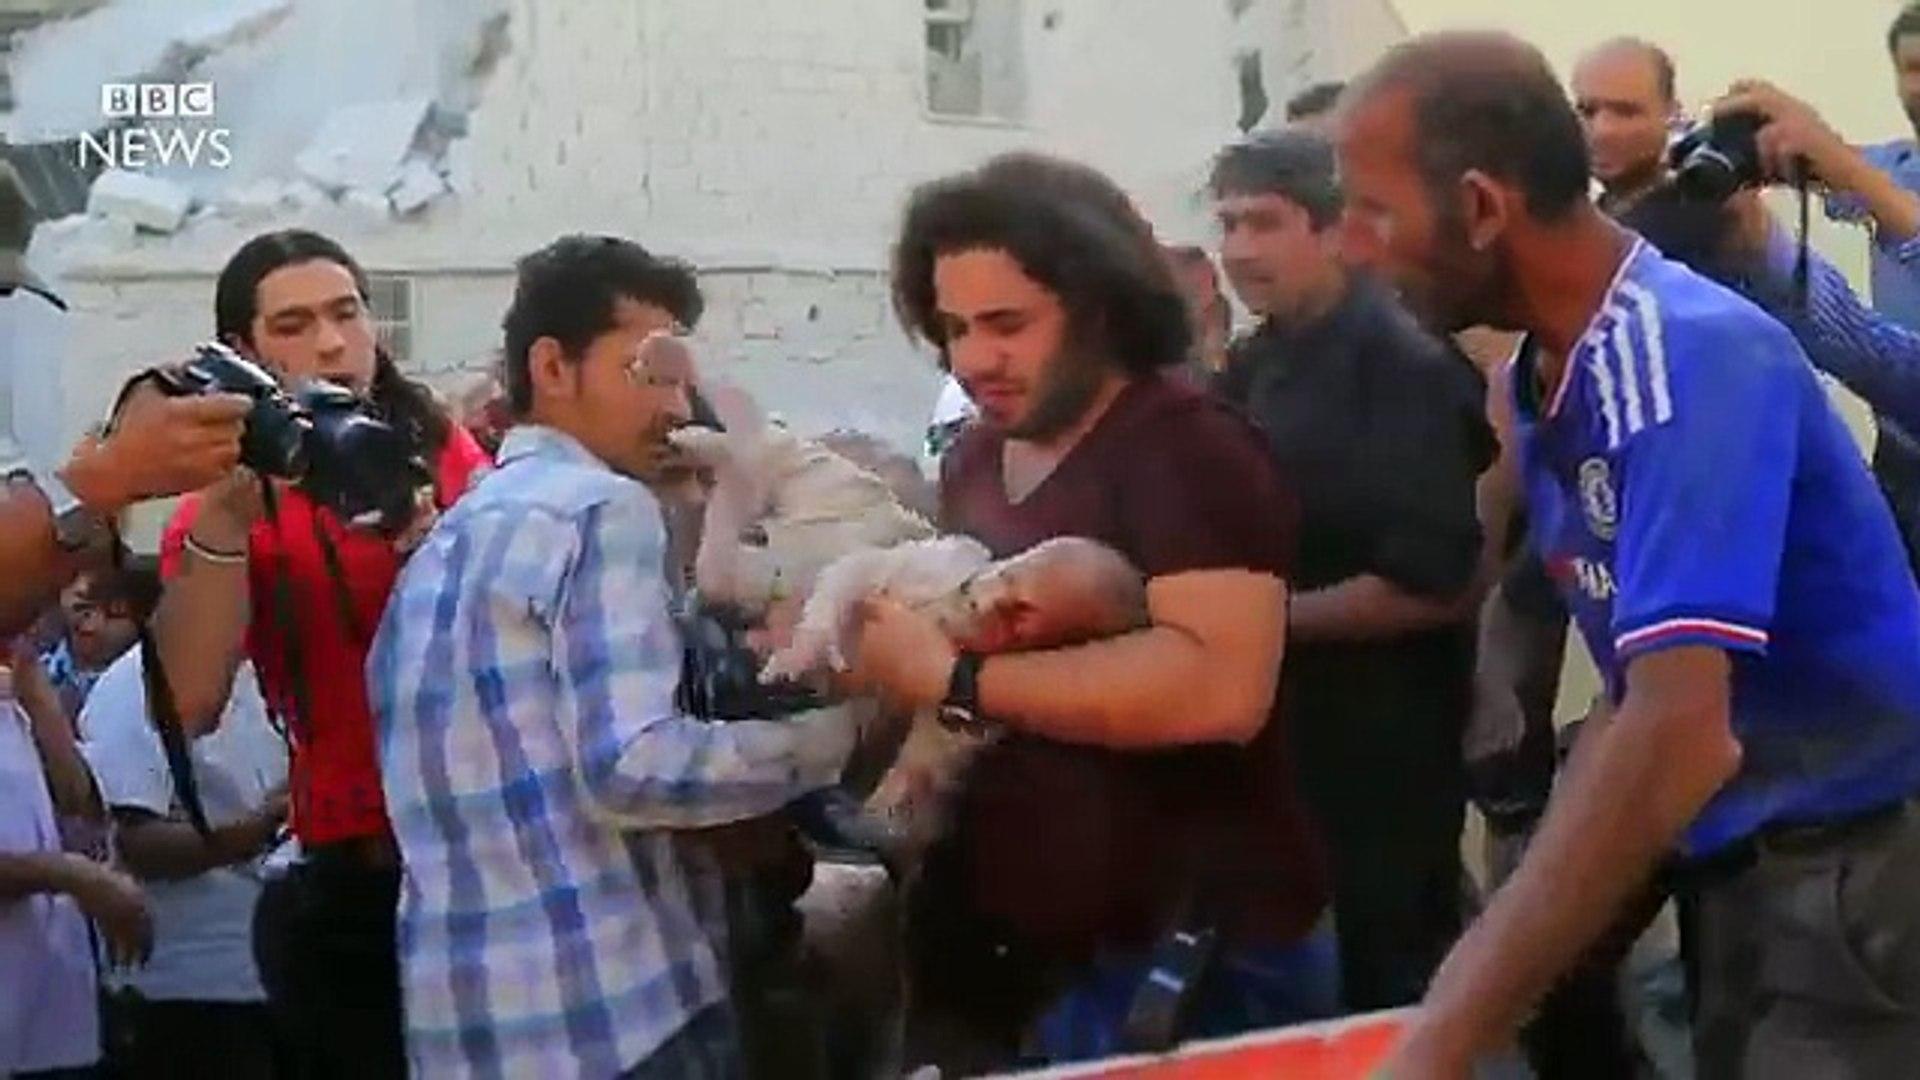 Inside Aleppo syria immediately after air strikes